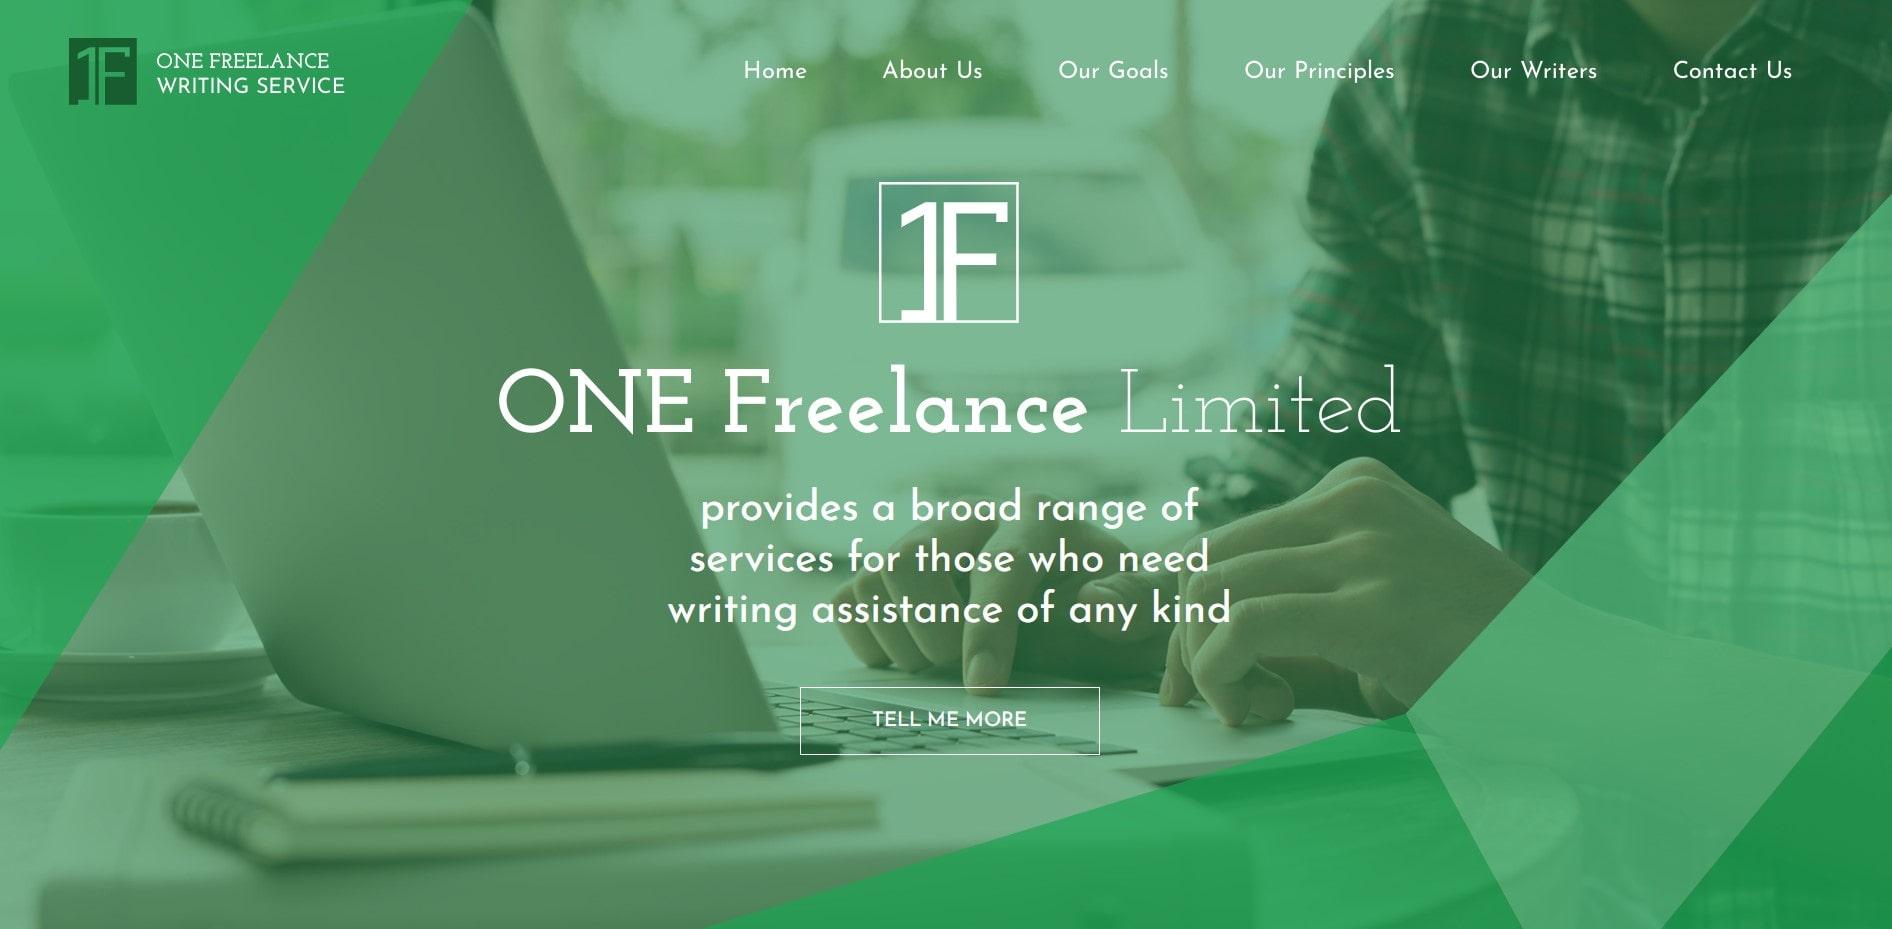 One Freelance Limited